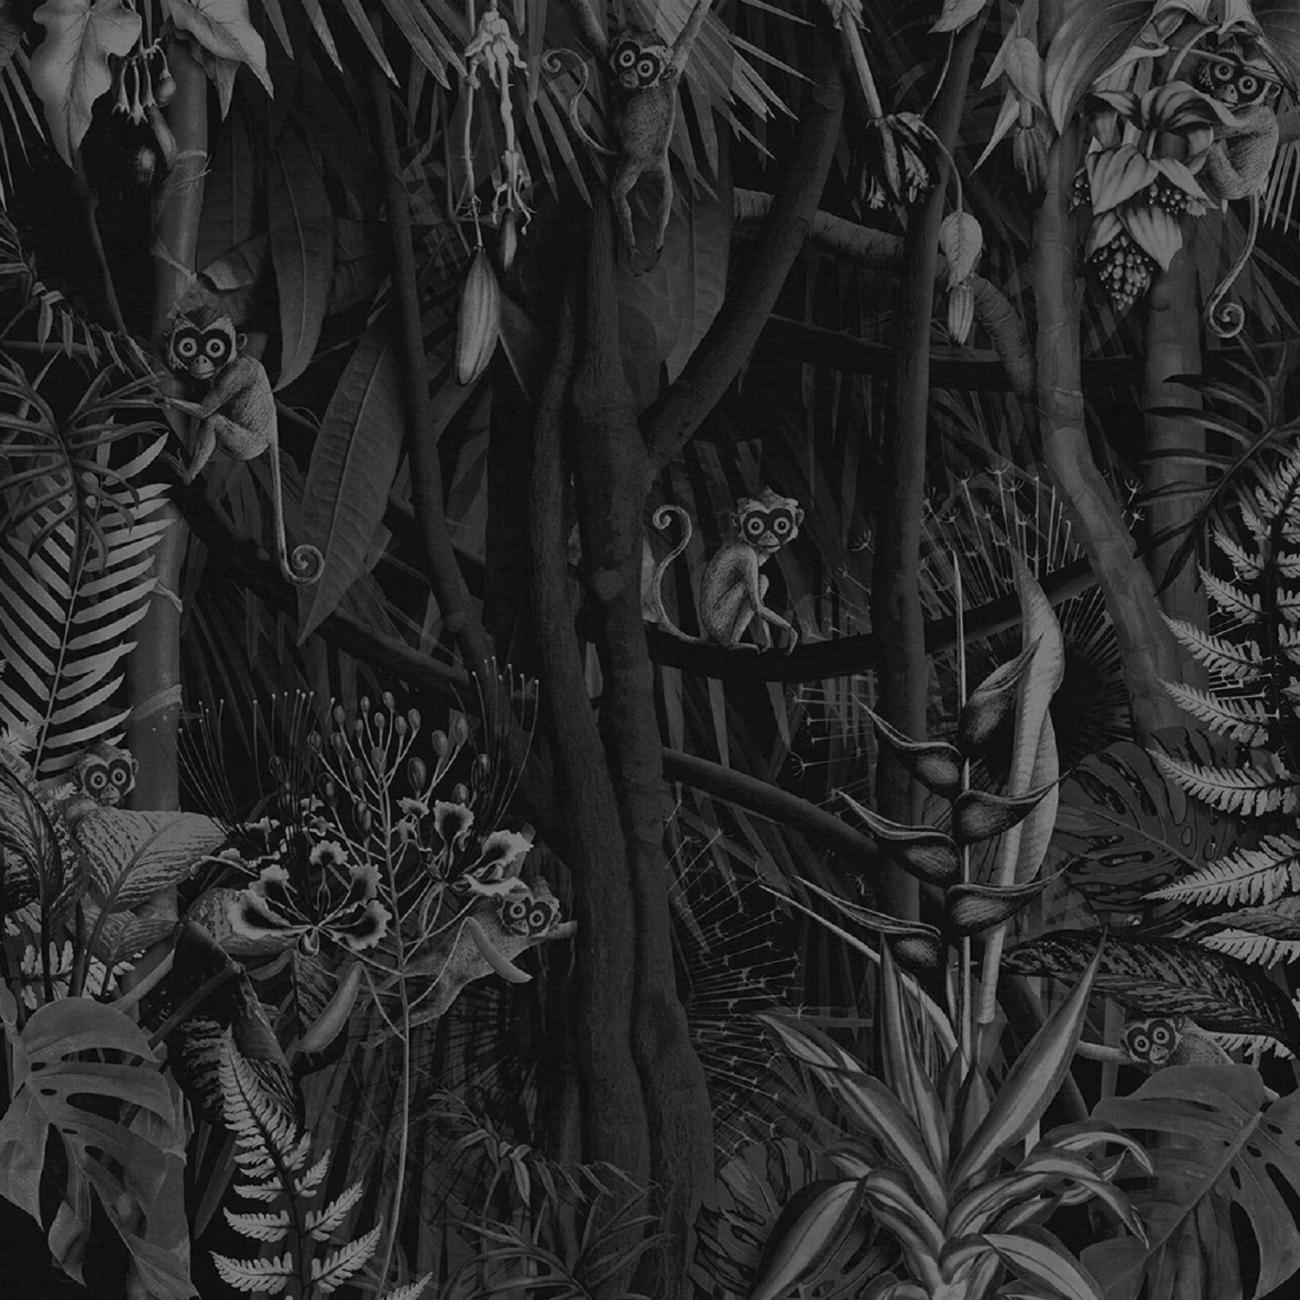 Carta Da Parati London Art.London Art Looks In The Forest Wallpaper Tattahome